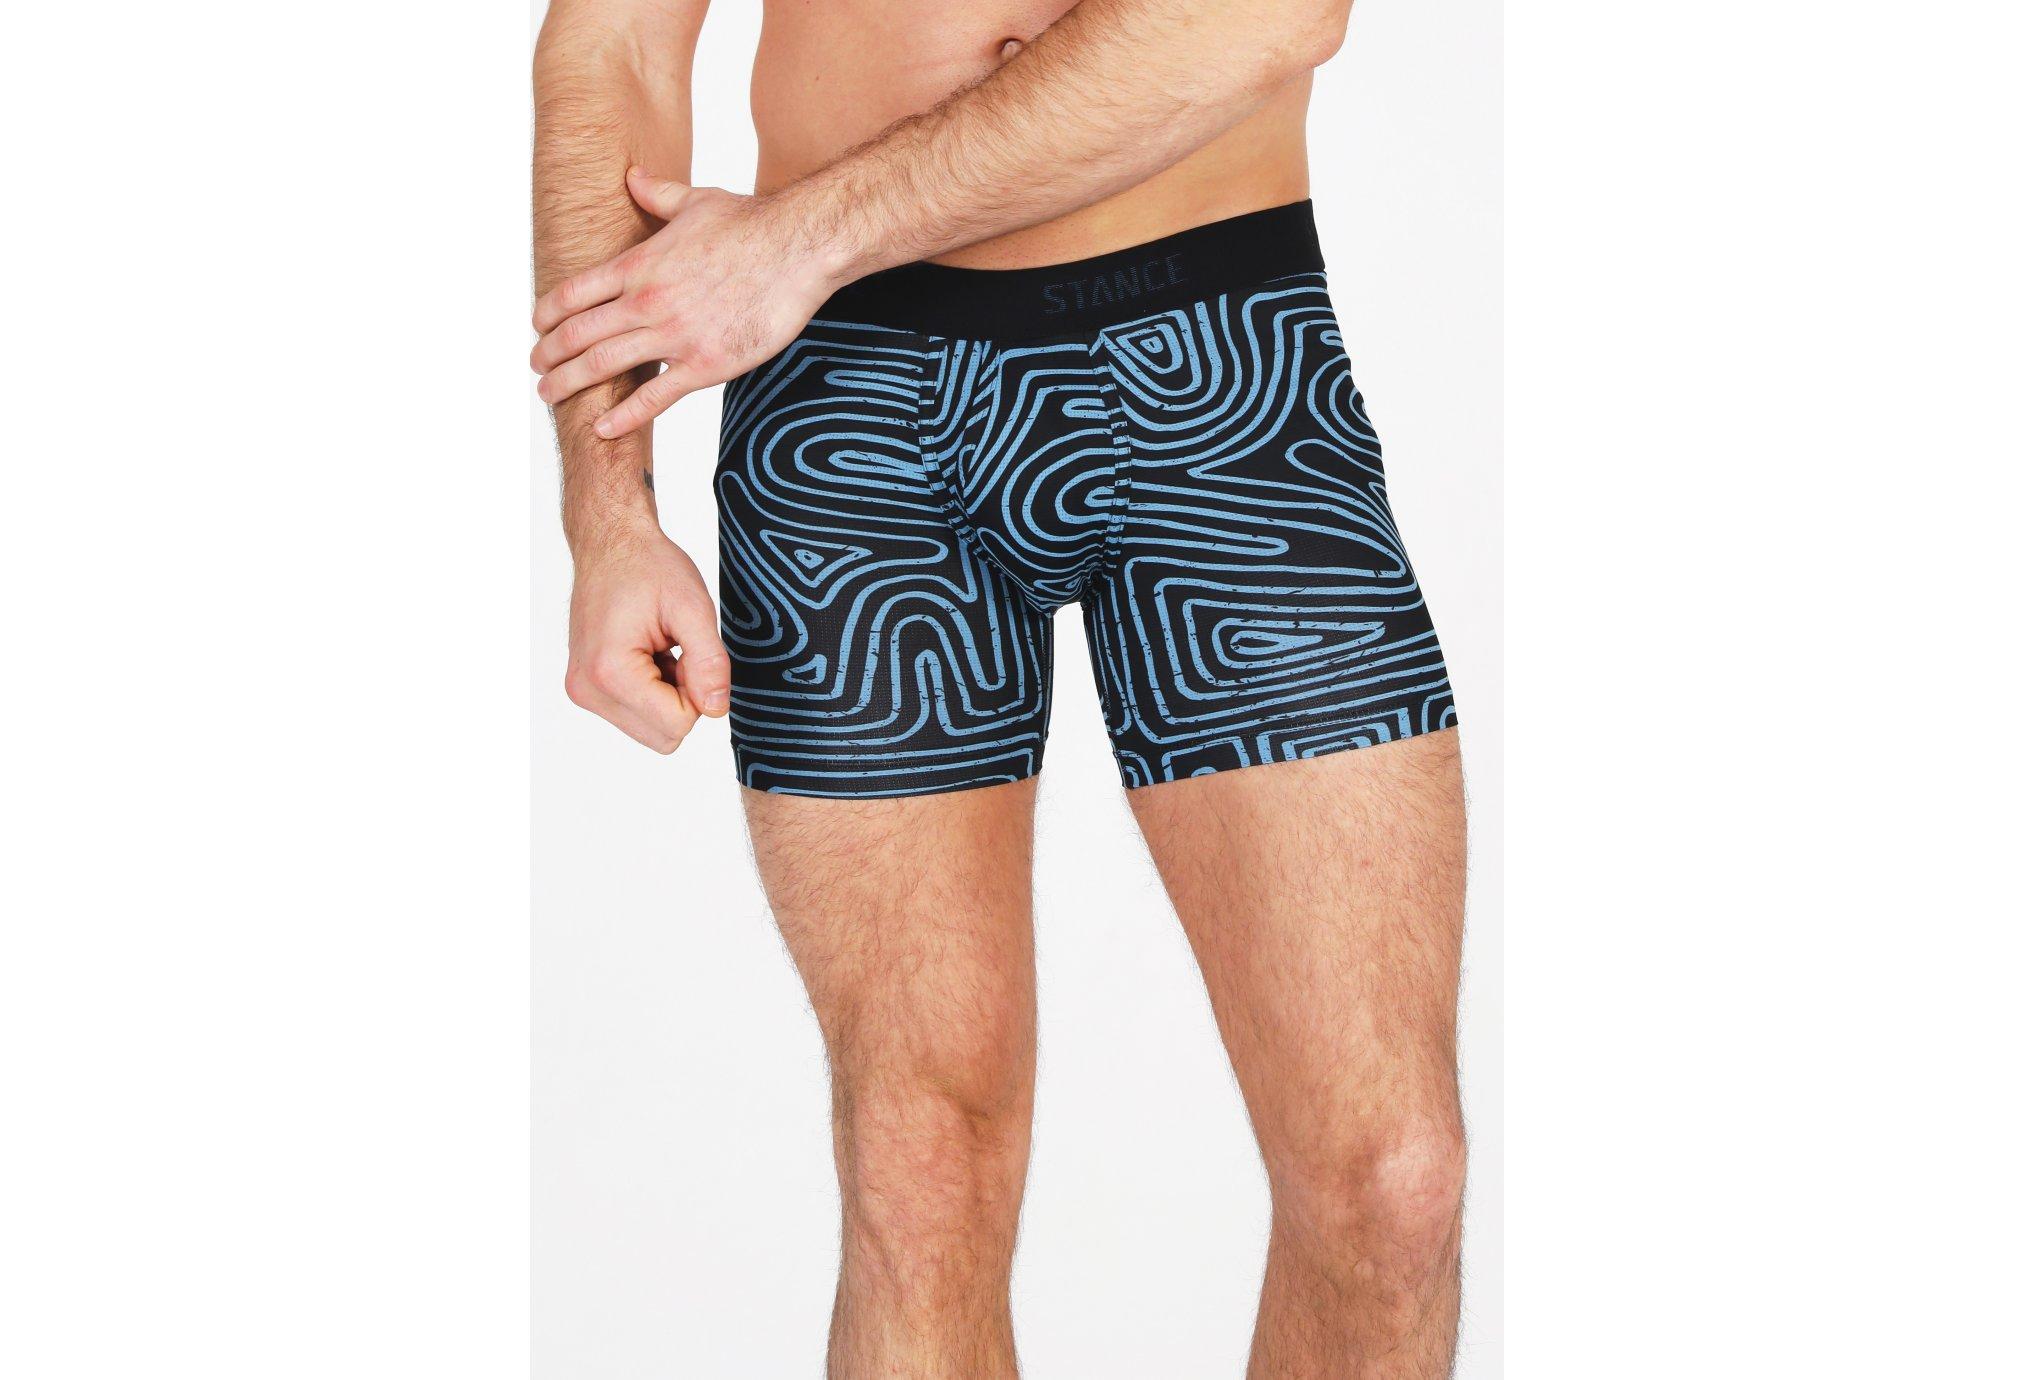 Stance Wholester Amaizing Boxer Brief M vêtement running homme